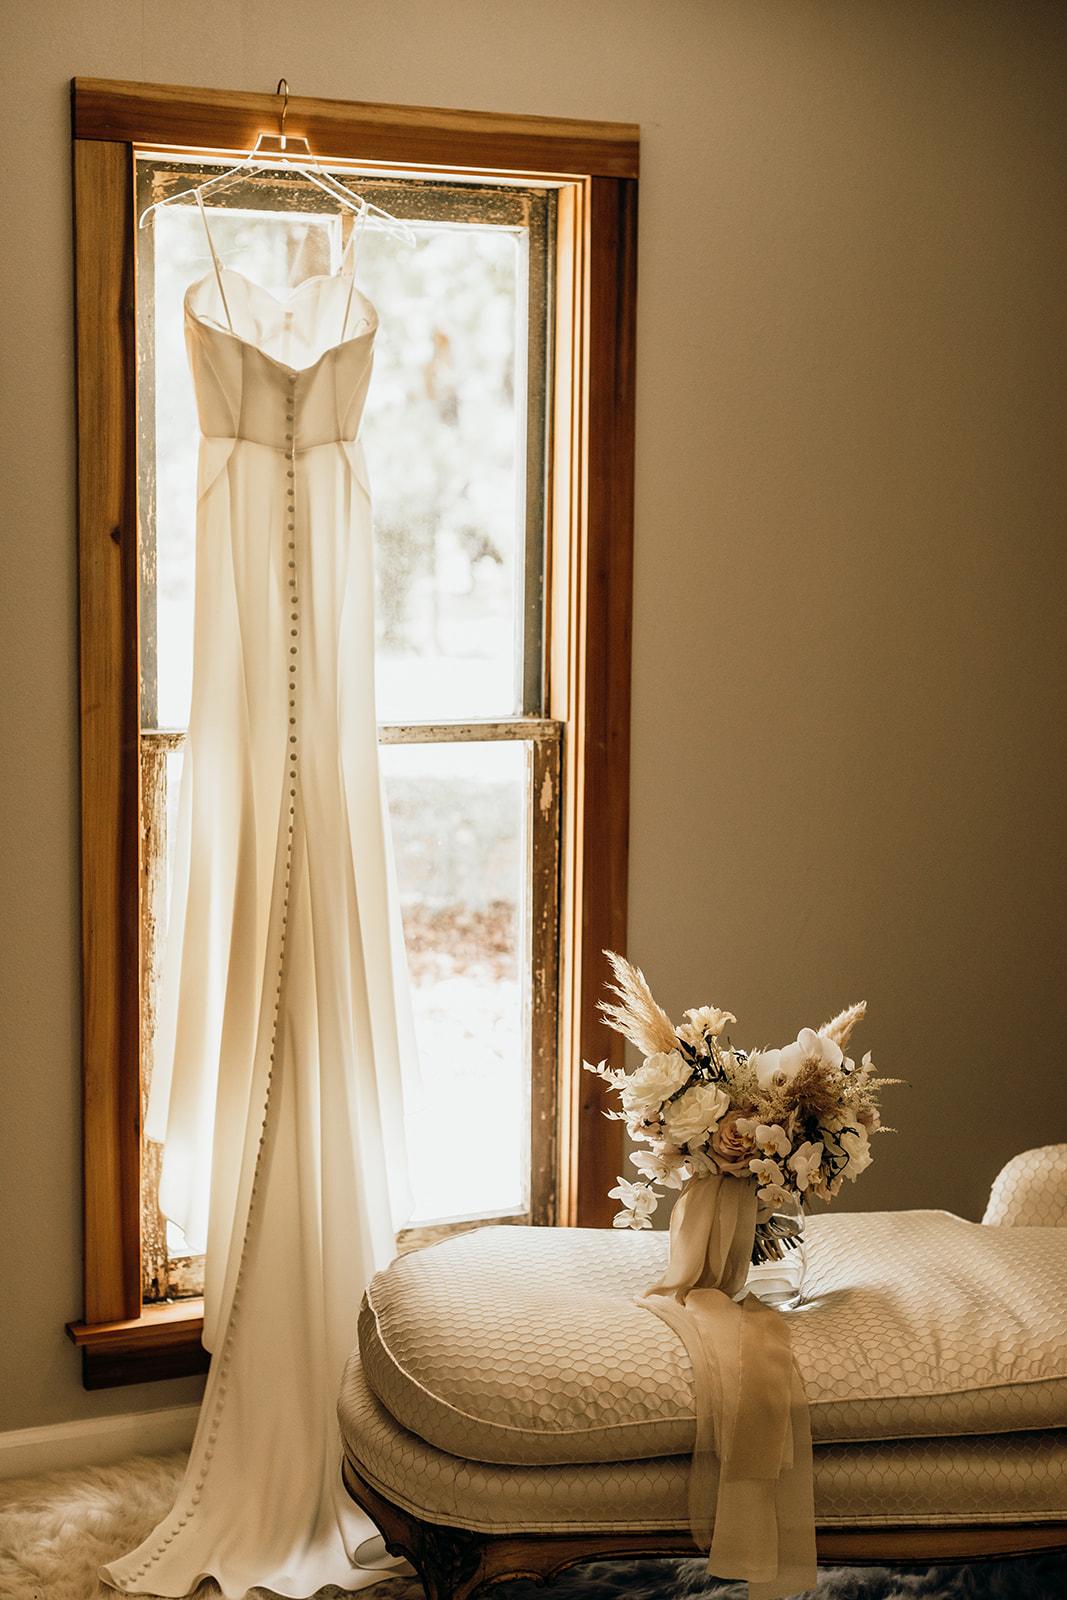 Casey-Josh-Pearl-In-The-Wild-Tallahassee-Wedding-7_websize.jpg